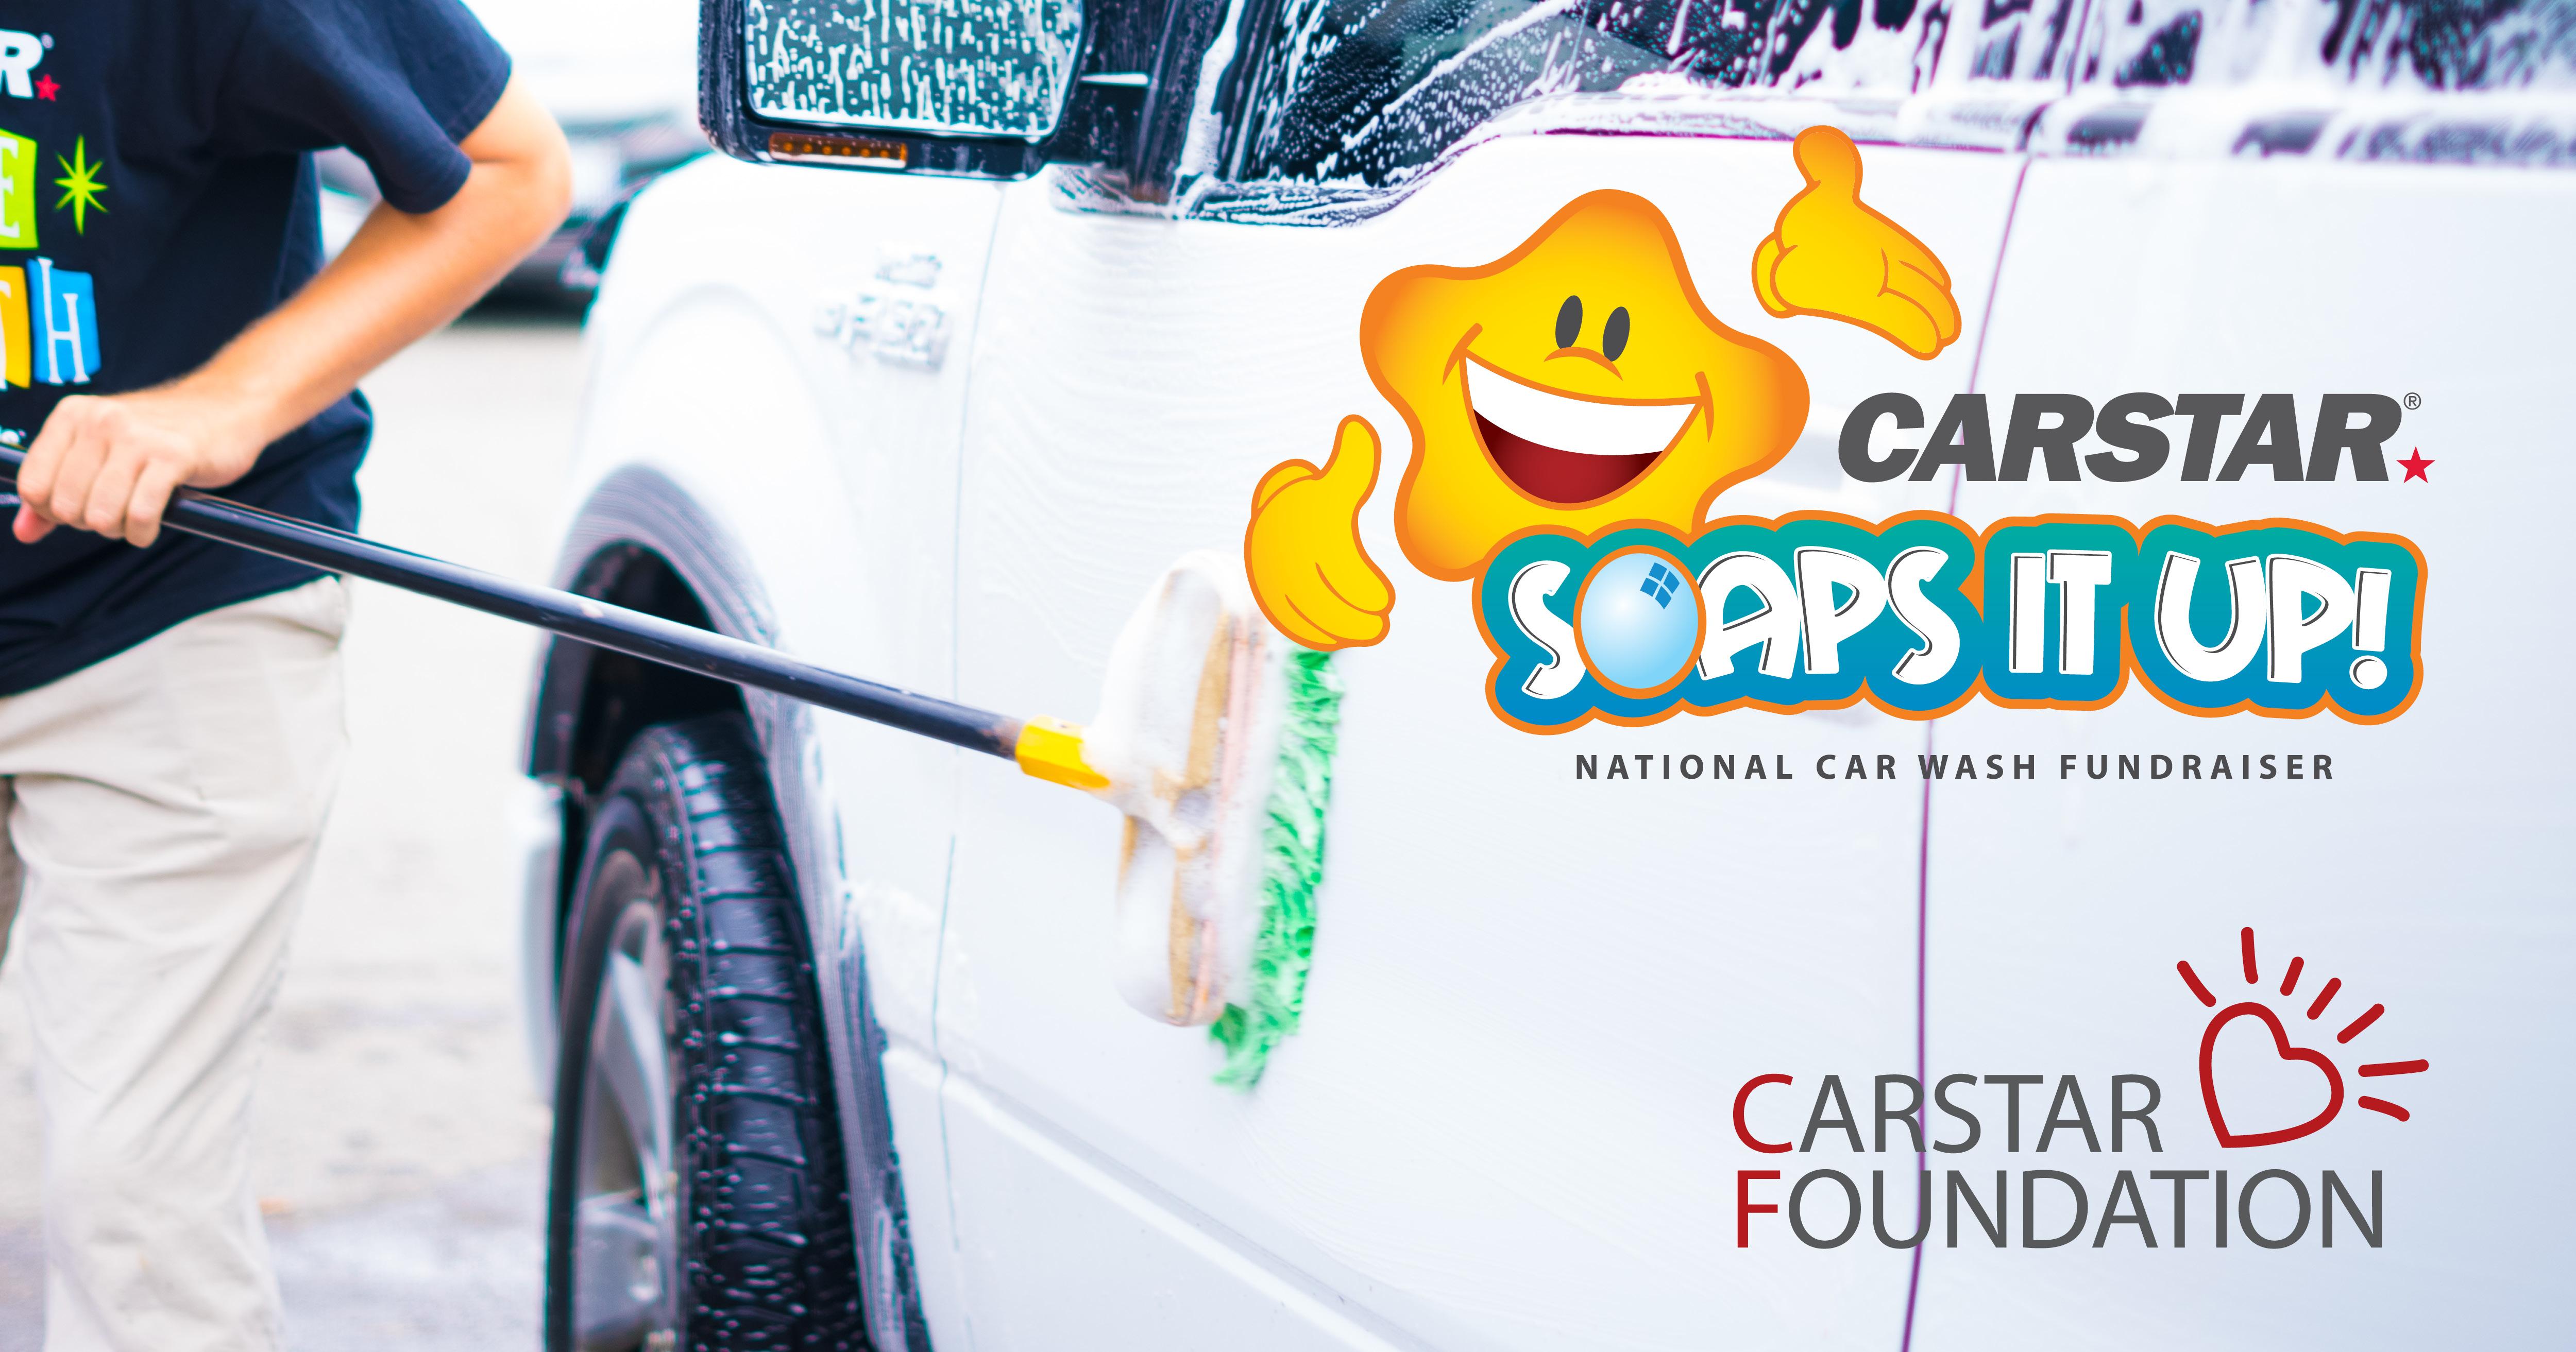 CARSTAR soaps it up, CARSTAR FOUNDATION